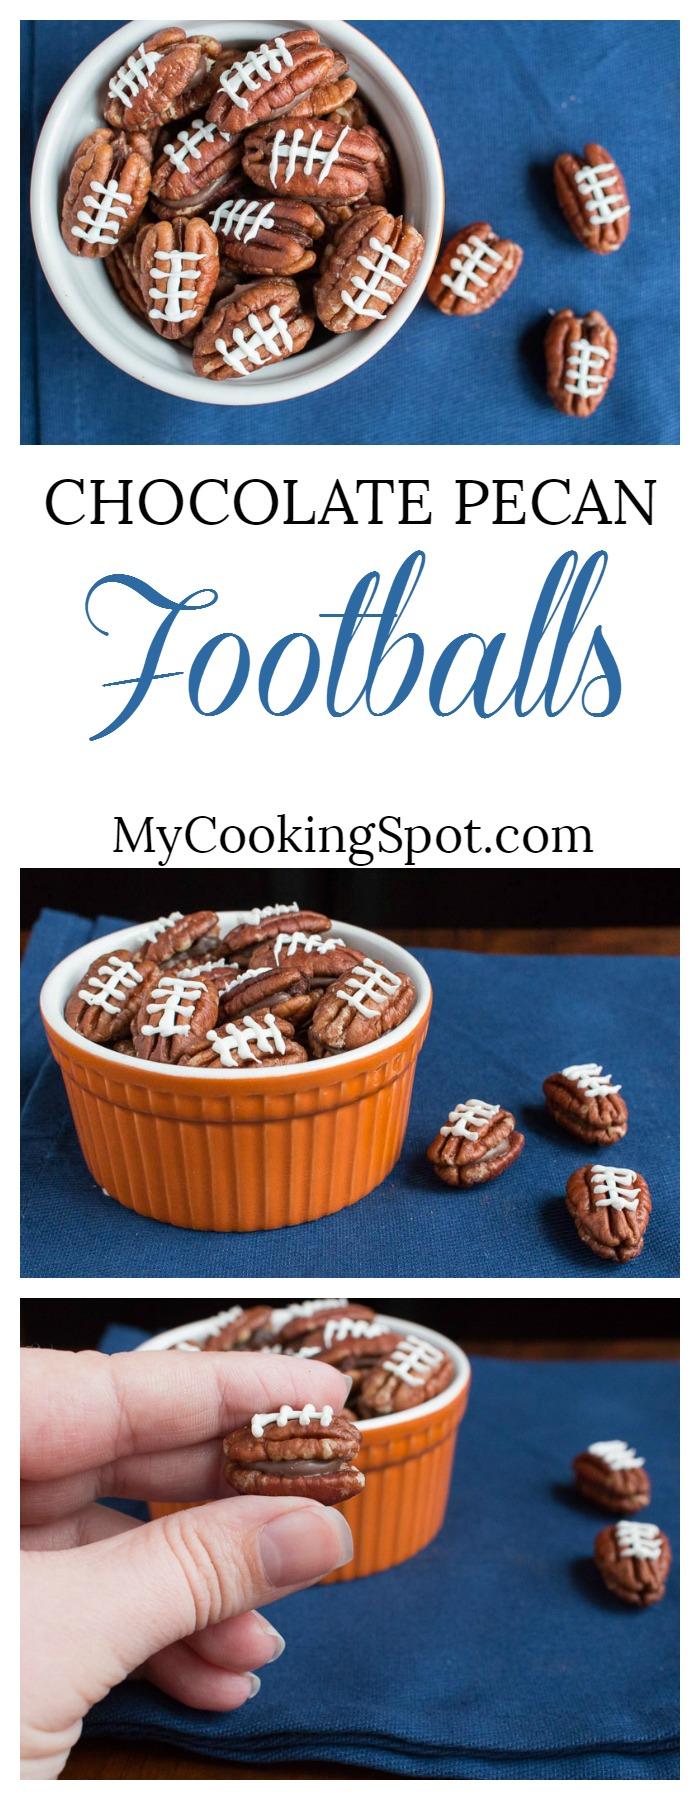 Pinterest - Chocolate Pecan Footballs